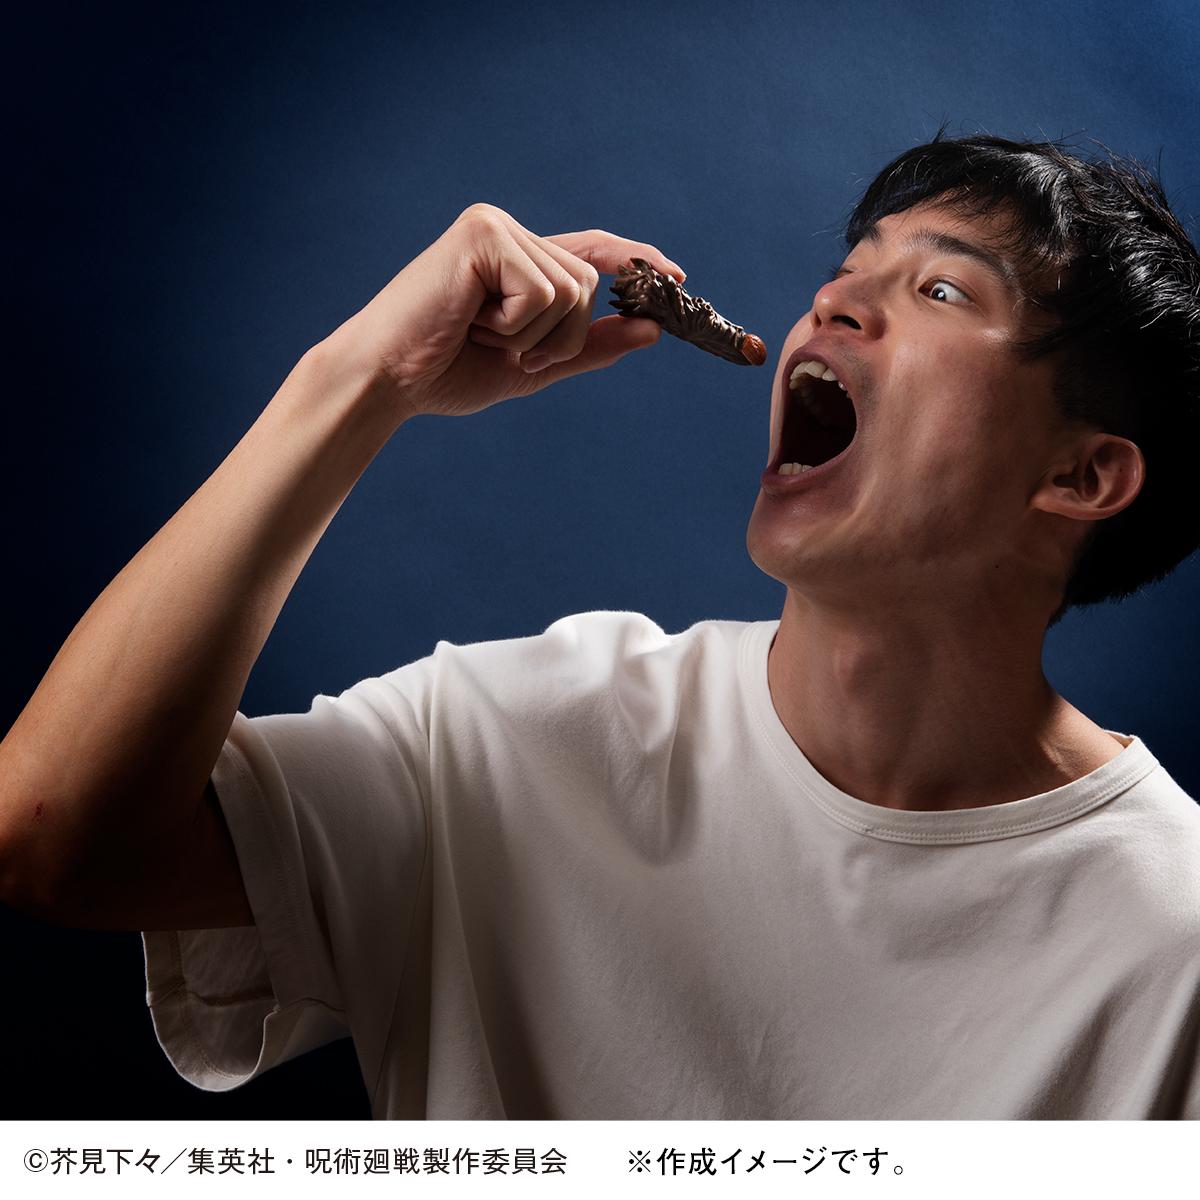 JUJUTSU KAISEN Sakuna finger